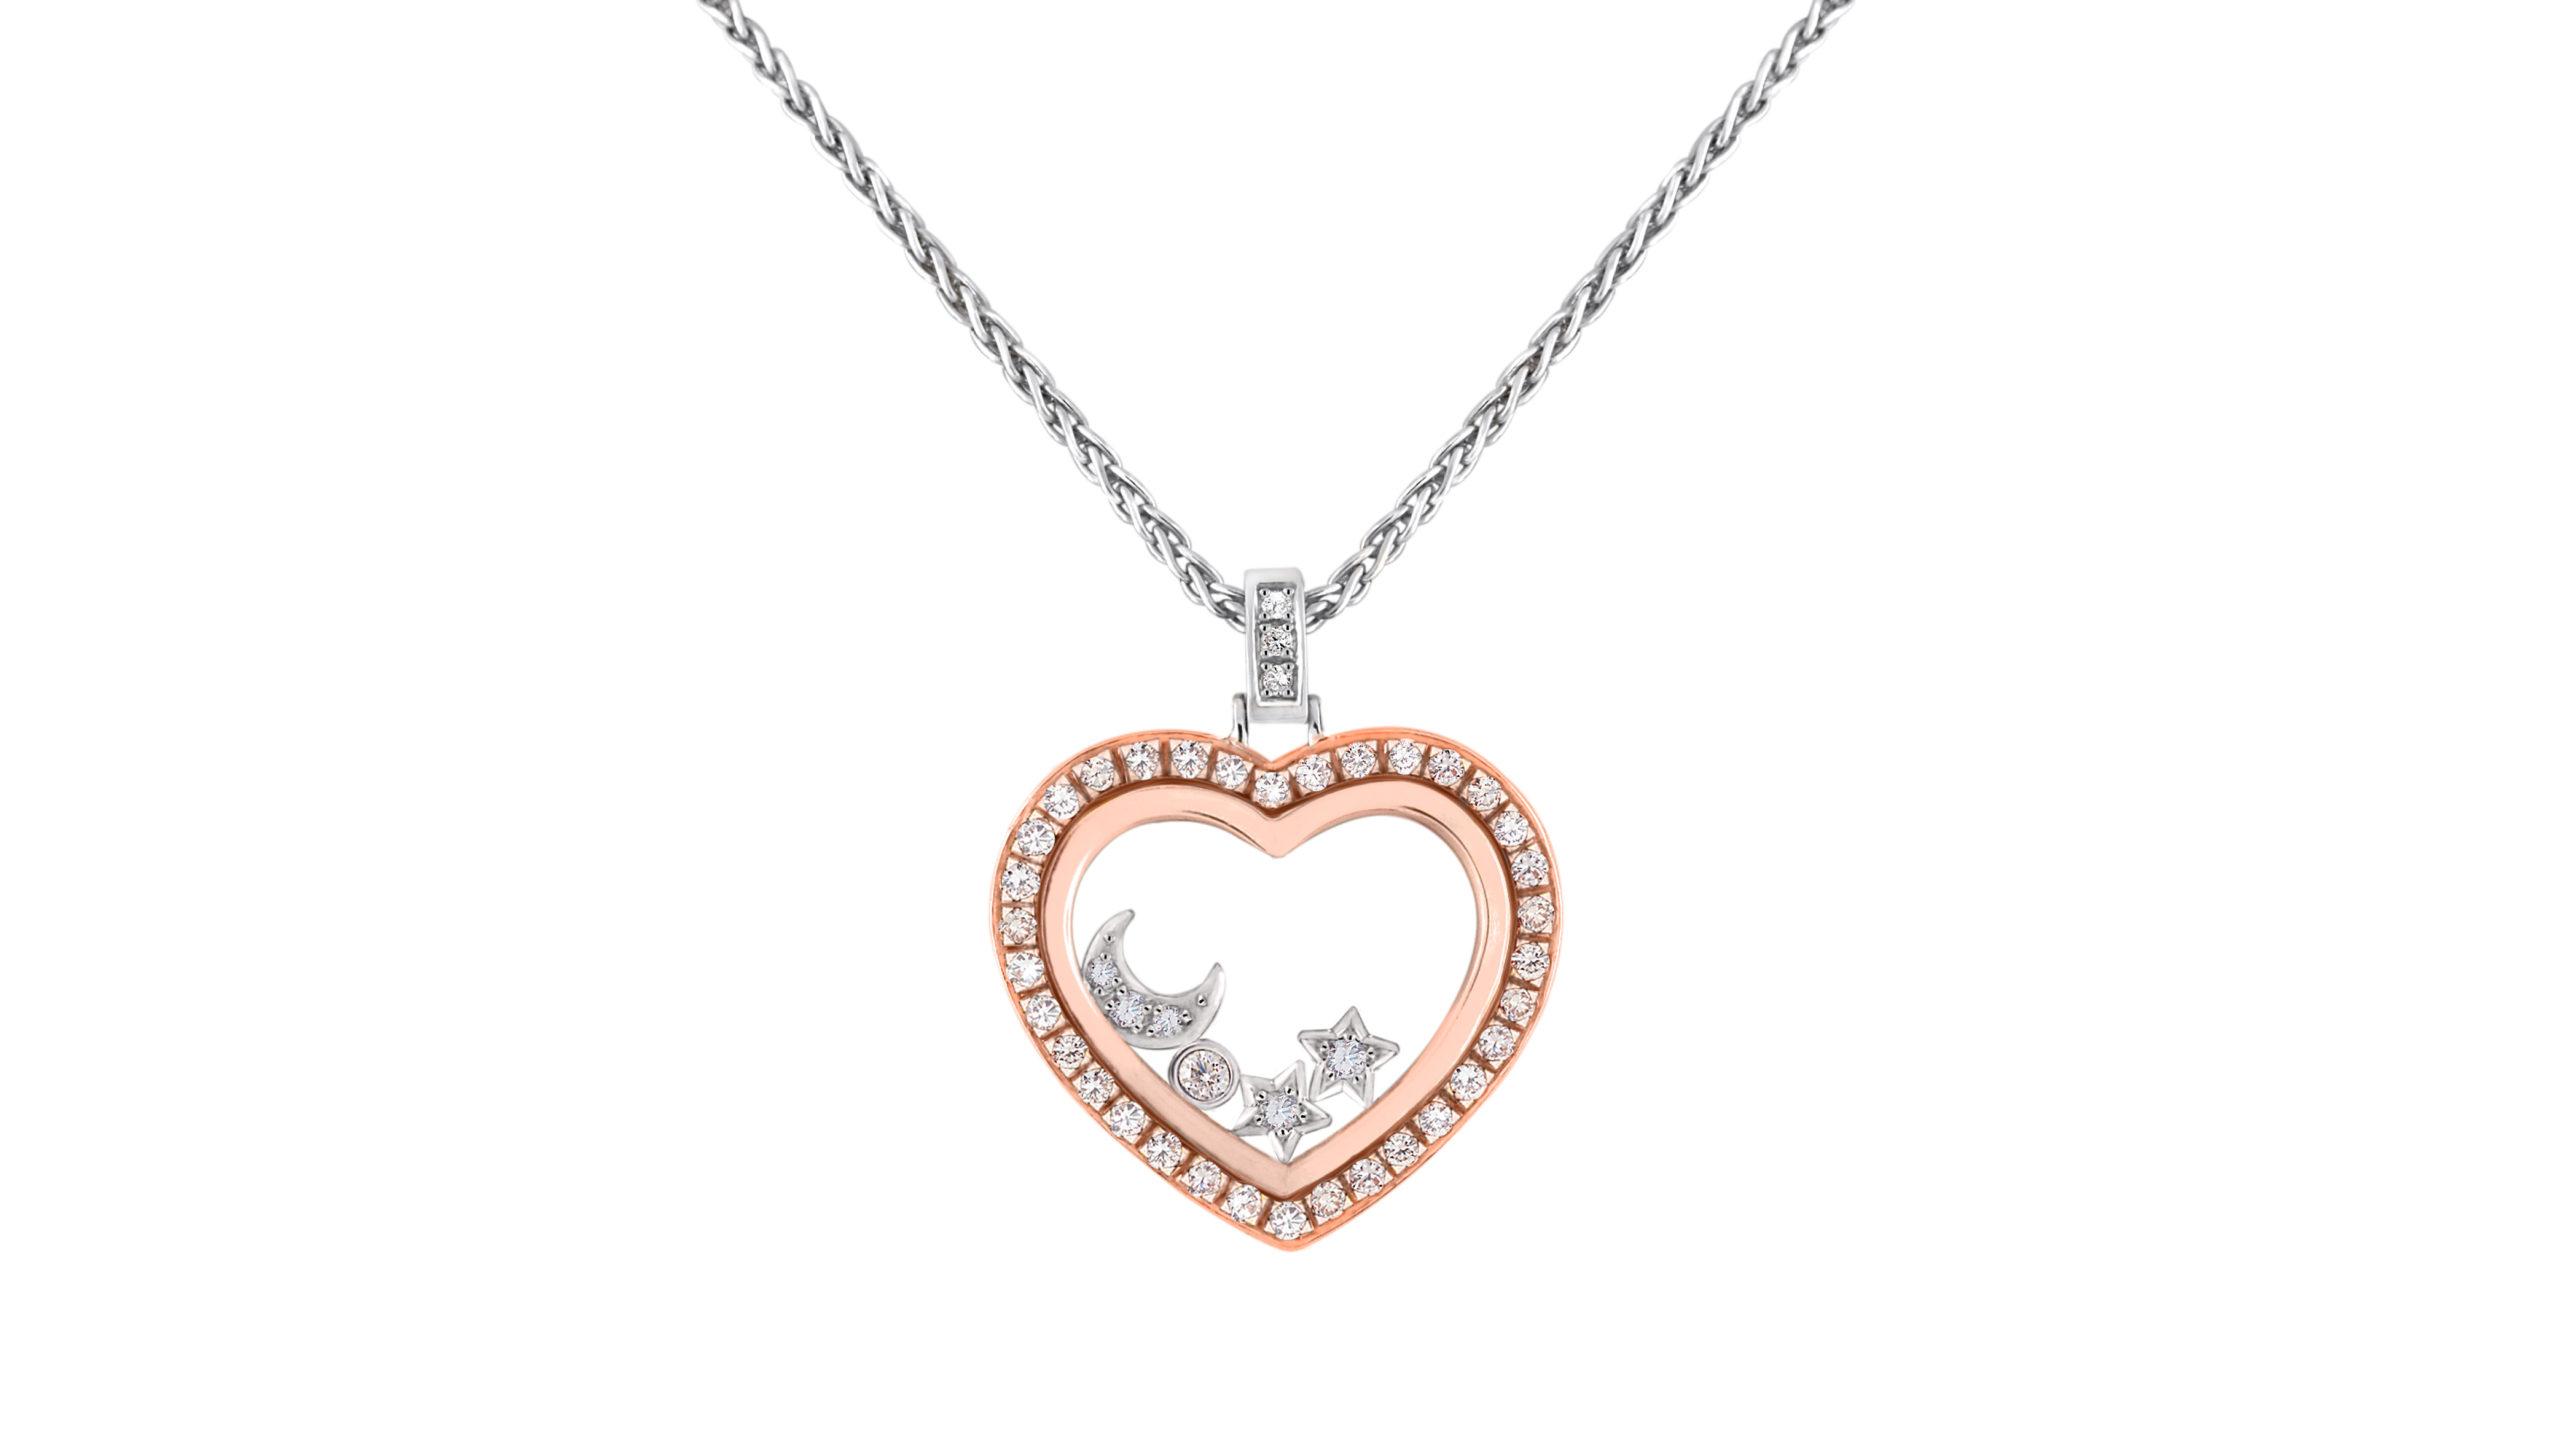 Enchanted Diamond Starry Night Necklace